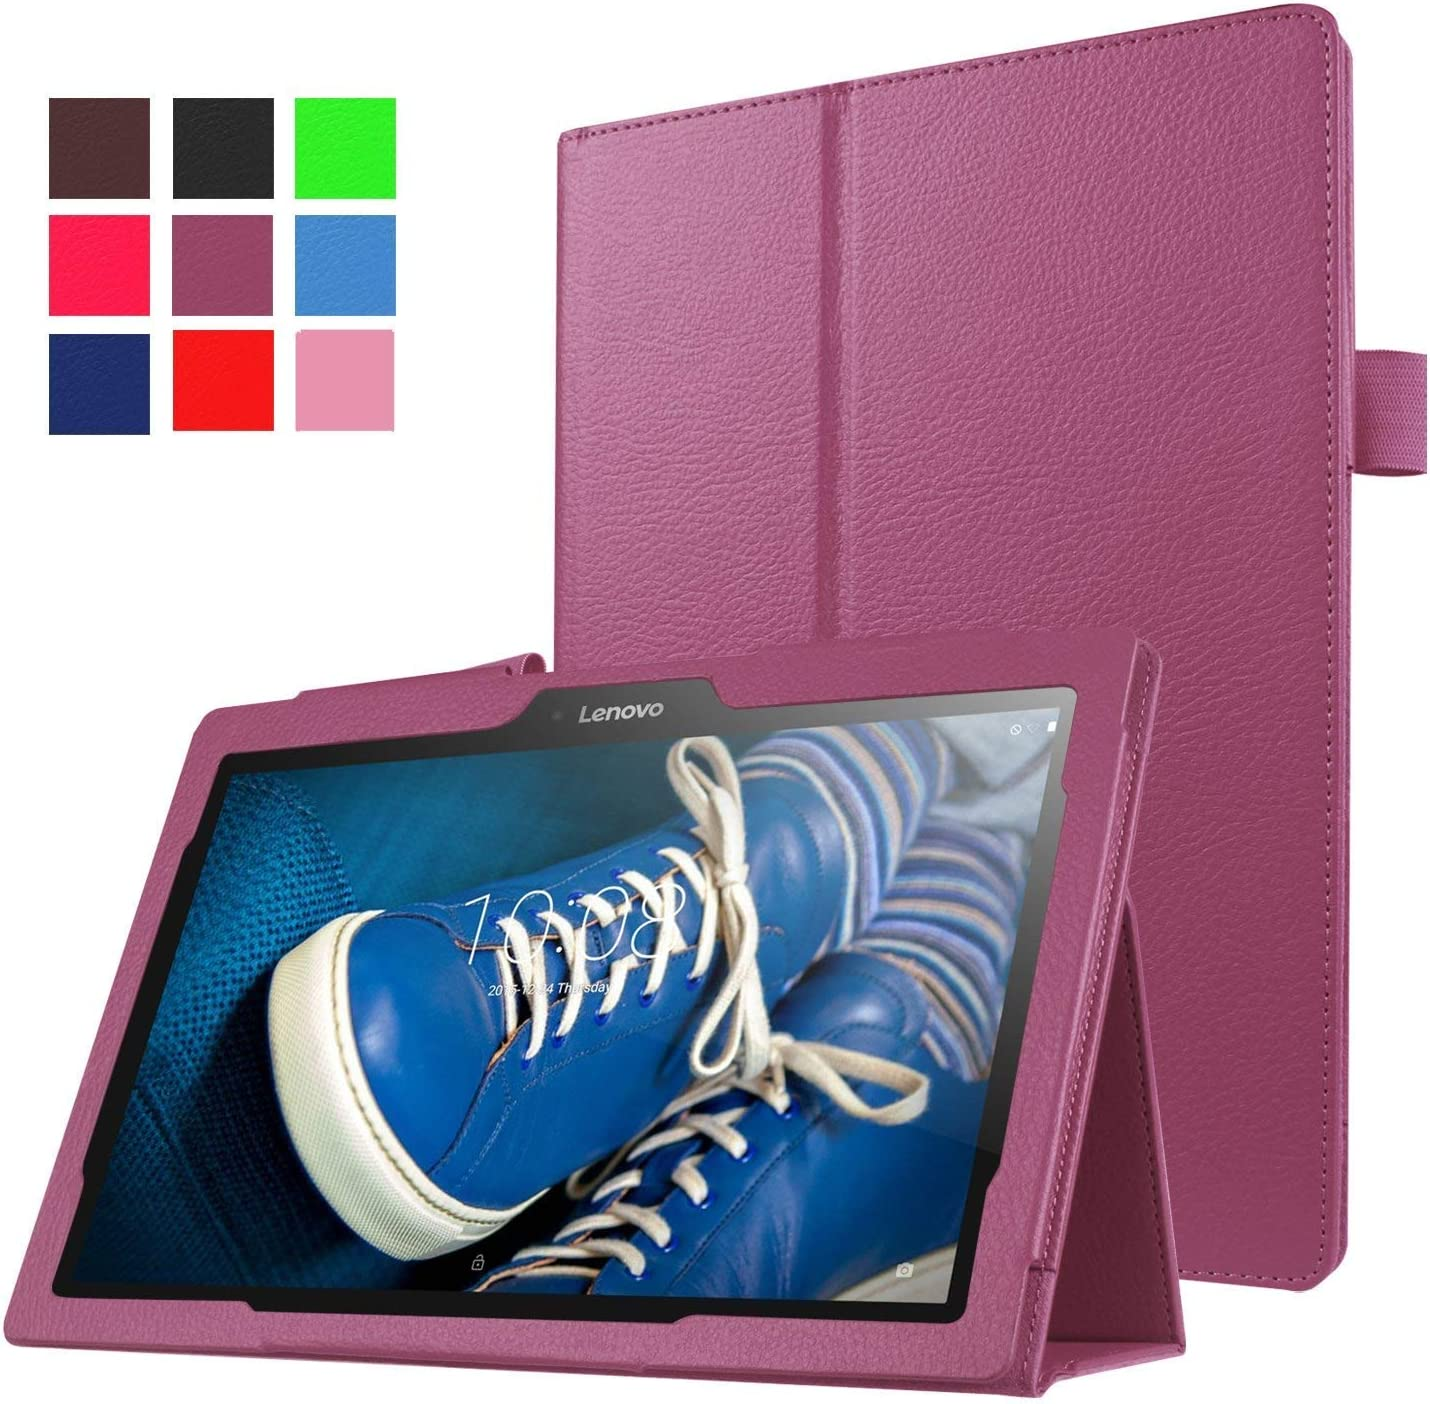 "Asng Lenovo Tab2 A10-70 Case - Slim Folding Stand Cover Smart Case for Lenovo Tab 2 A10-70, Tab 10(TB-X103F) 10.1"" Tablet (Purple)"